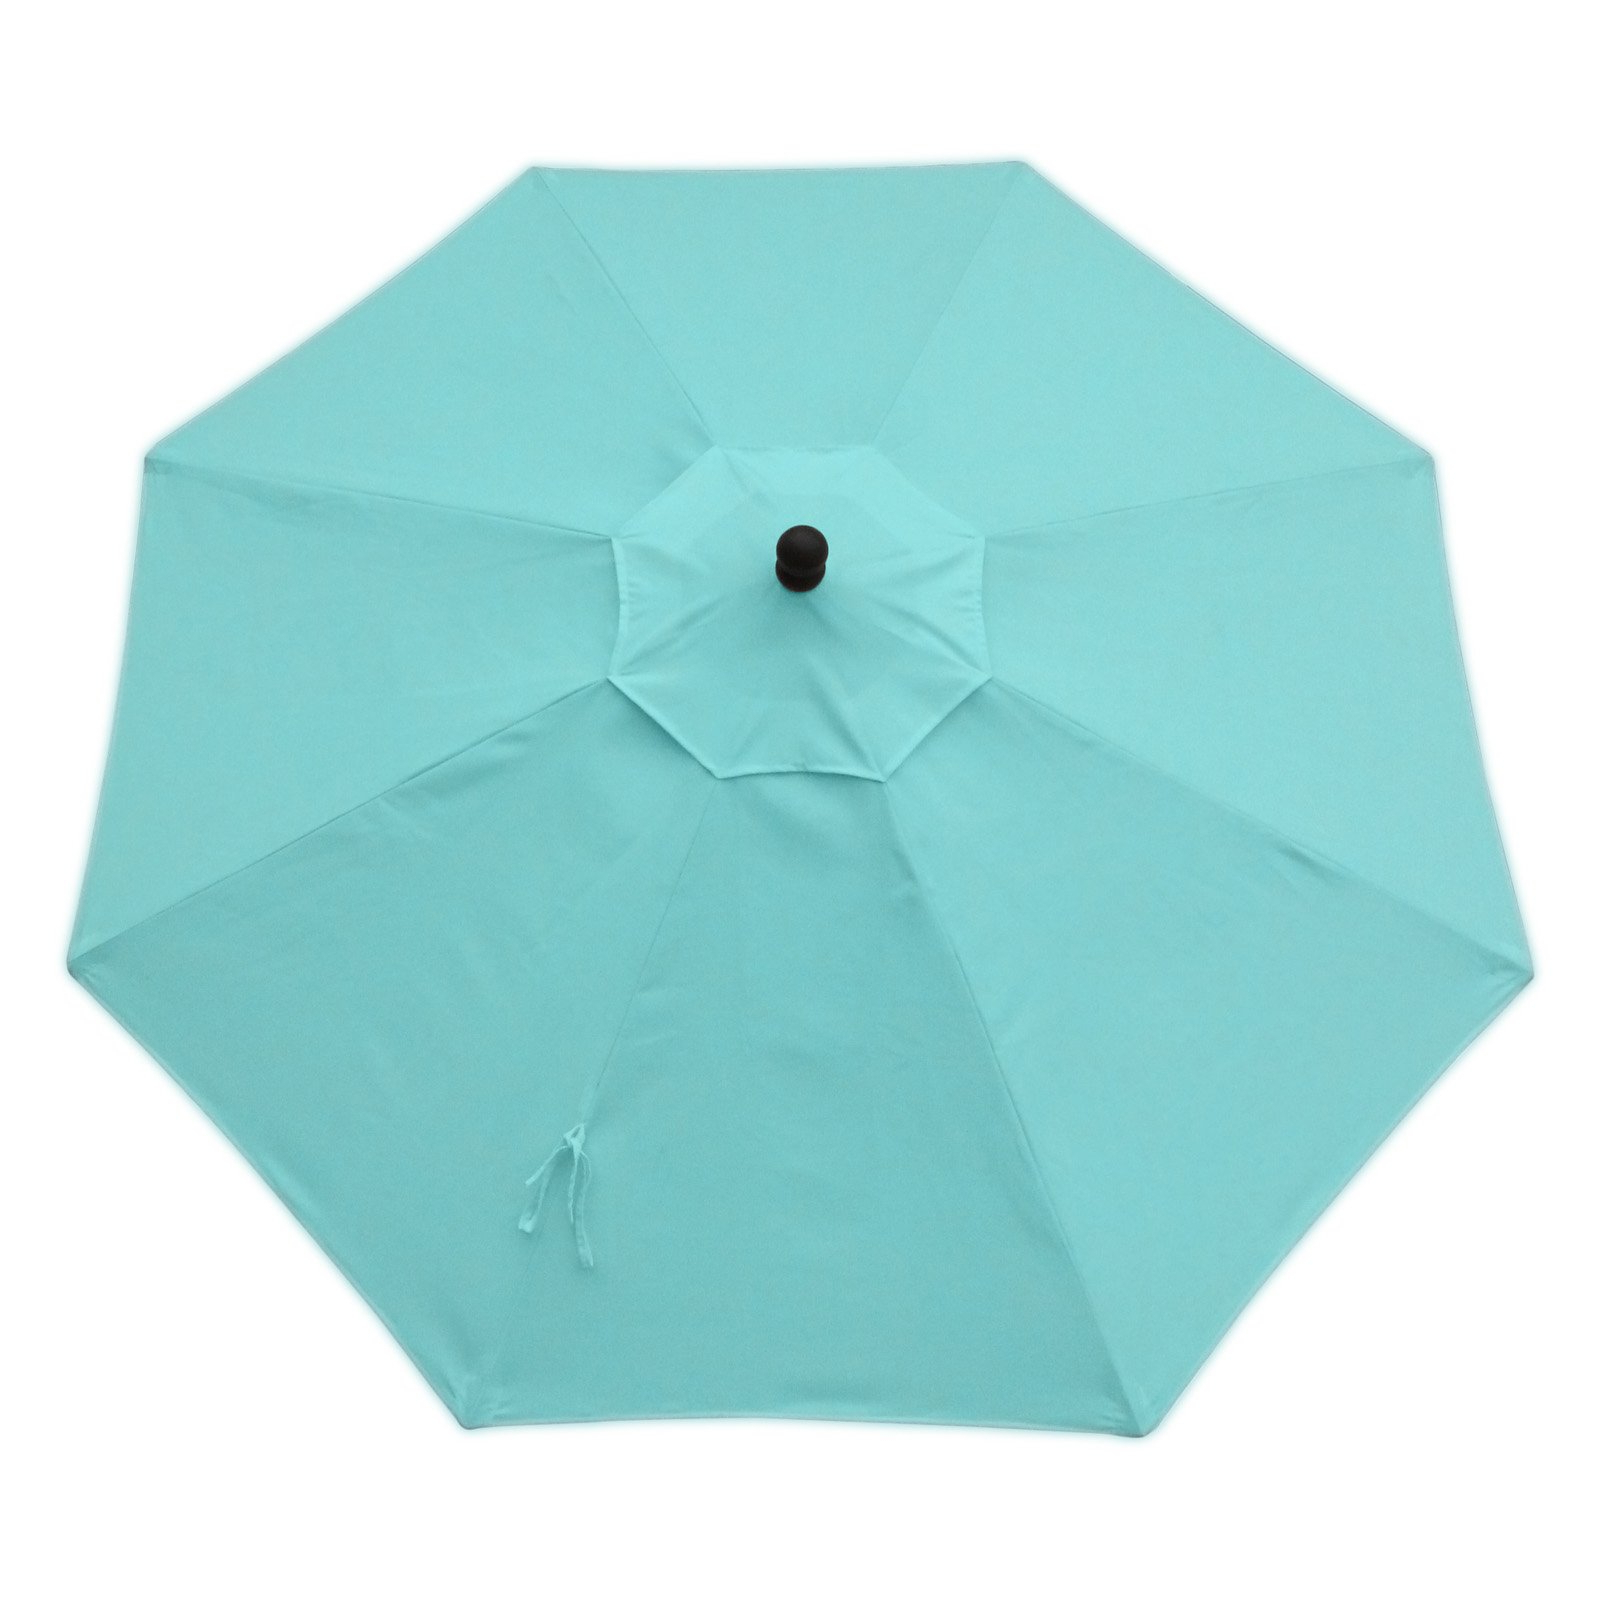 Wiechmann Push Tilt Market Sunbrella Umbrellas With Regard To Most Recent Bellini Resort 9' Market Umbrella Fabric: Canvas Heather Beige (View 18 of 20)